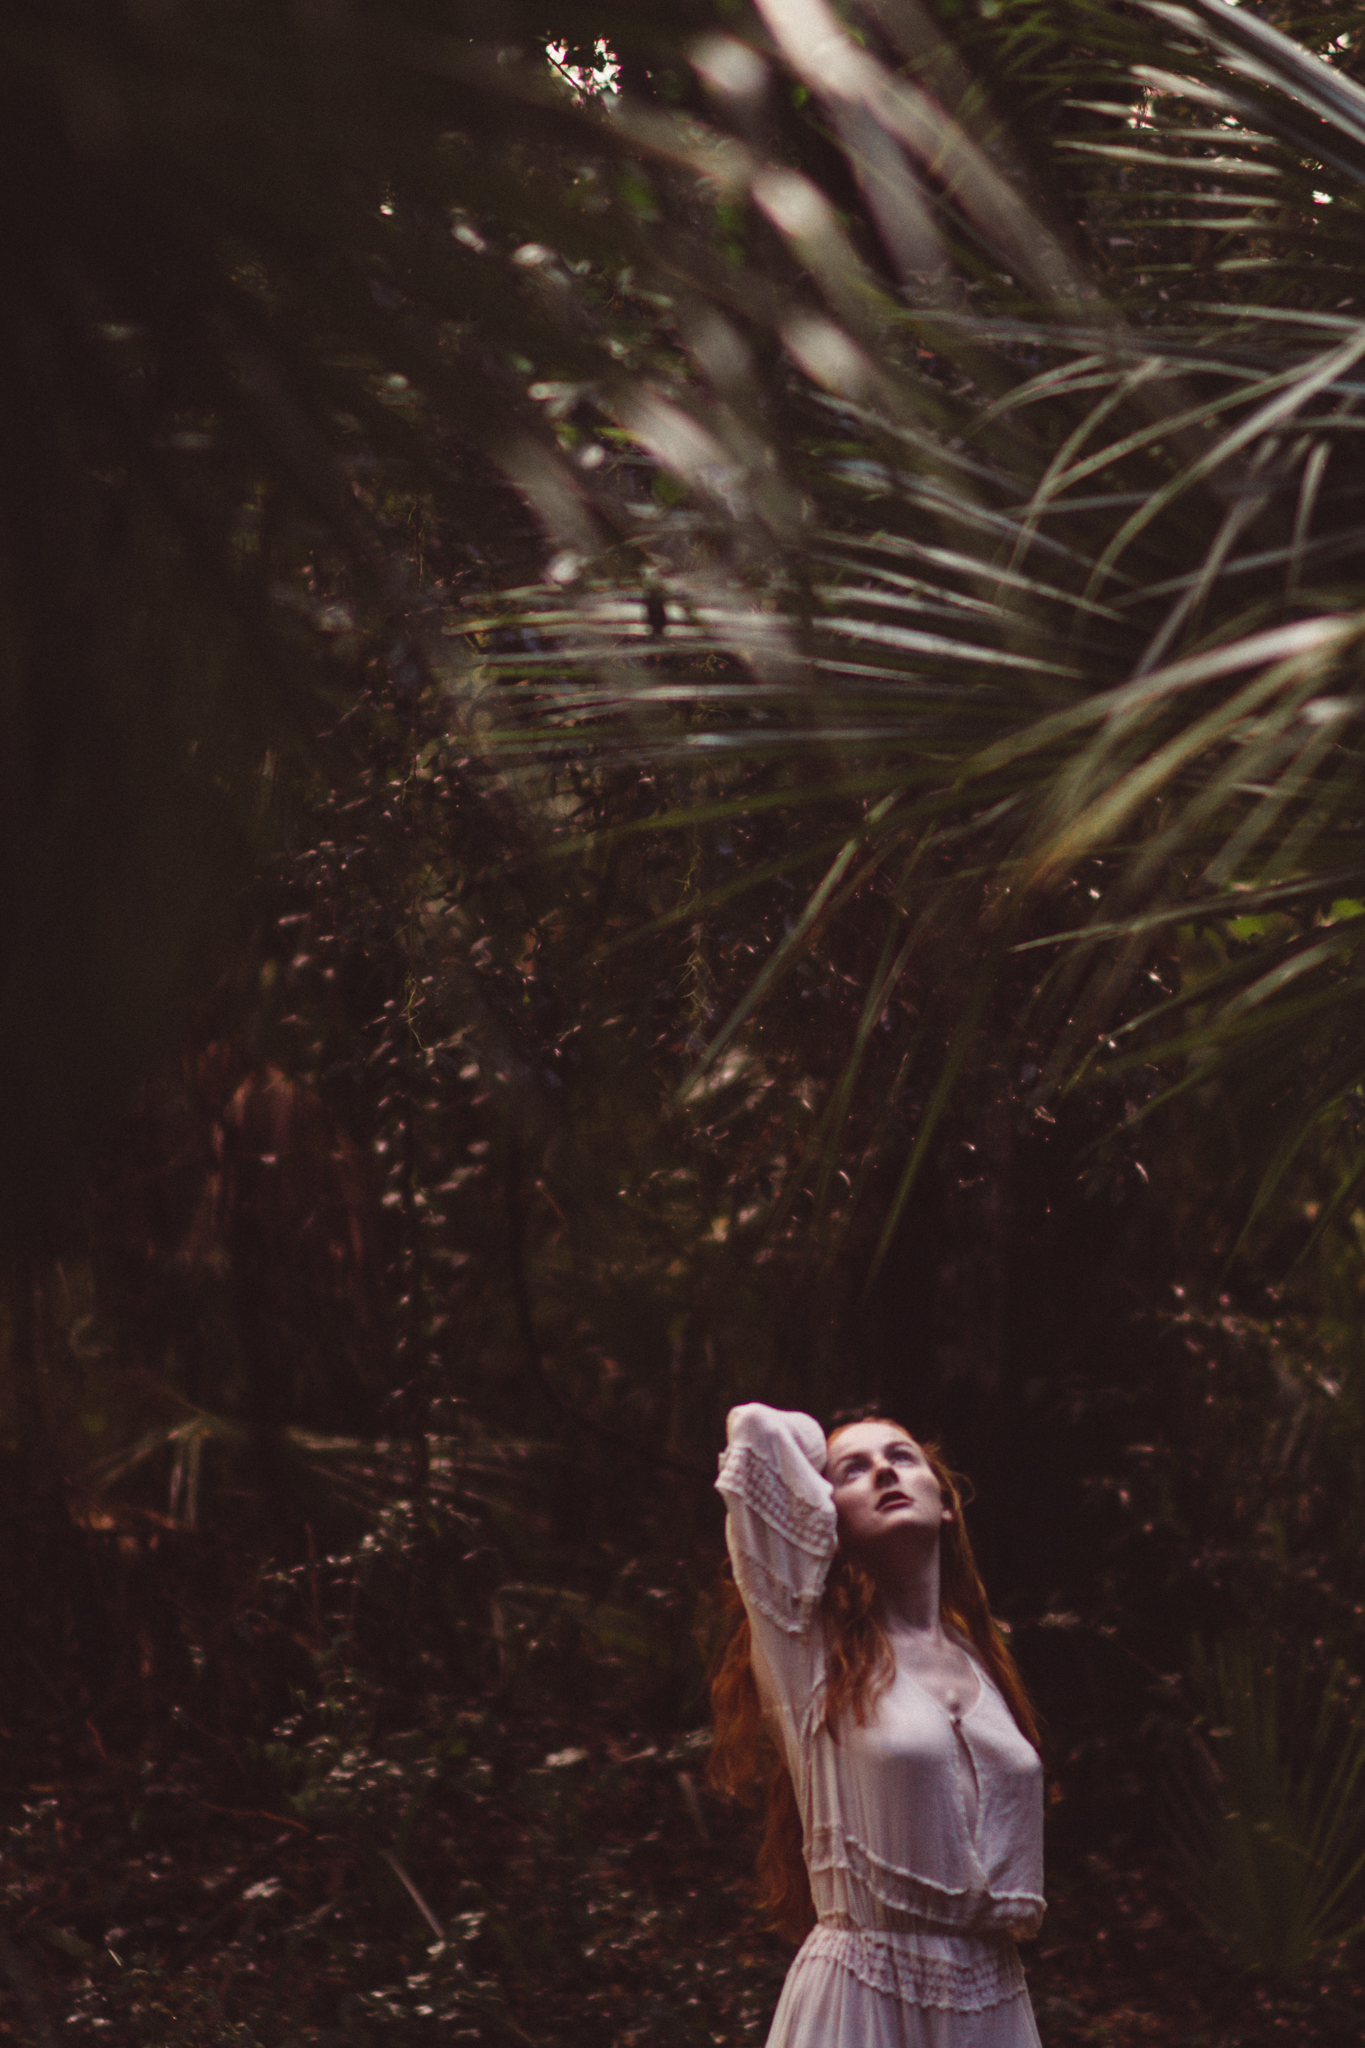 Copyright © Kylee Parks 2016